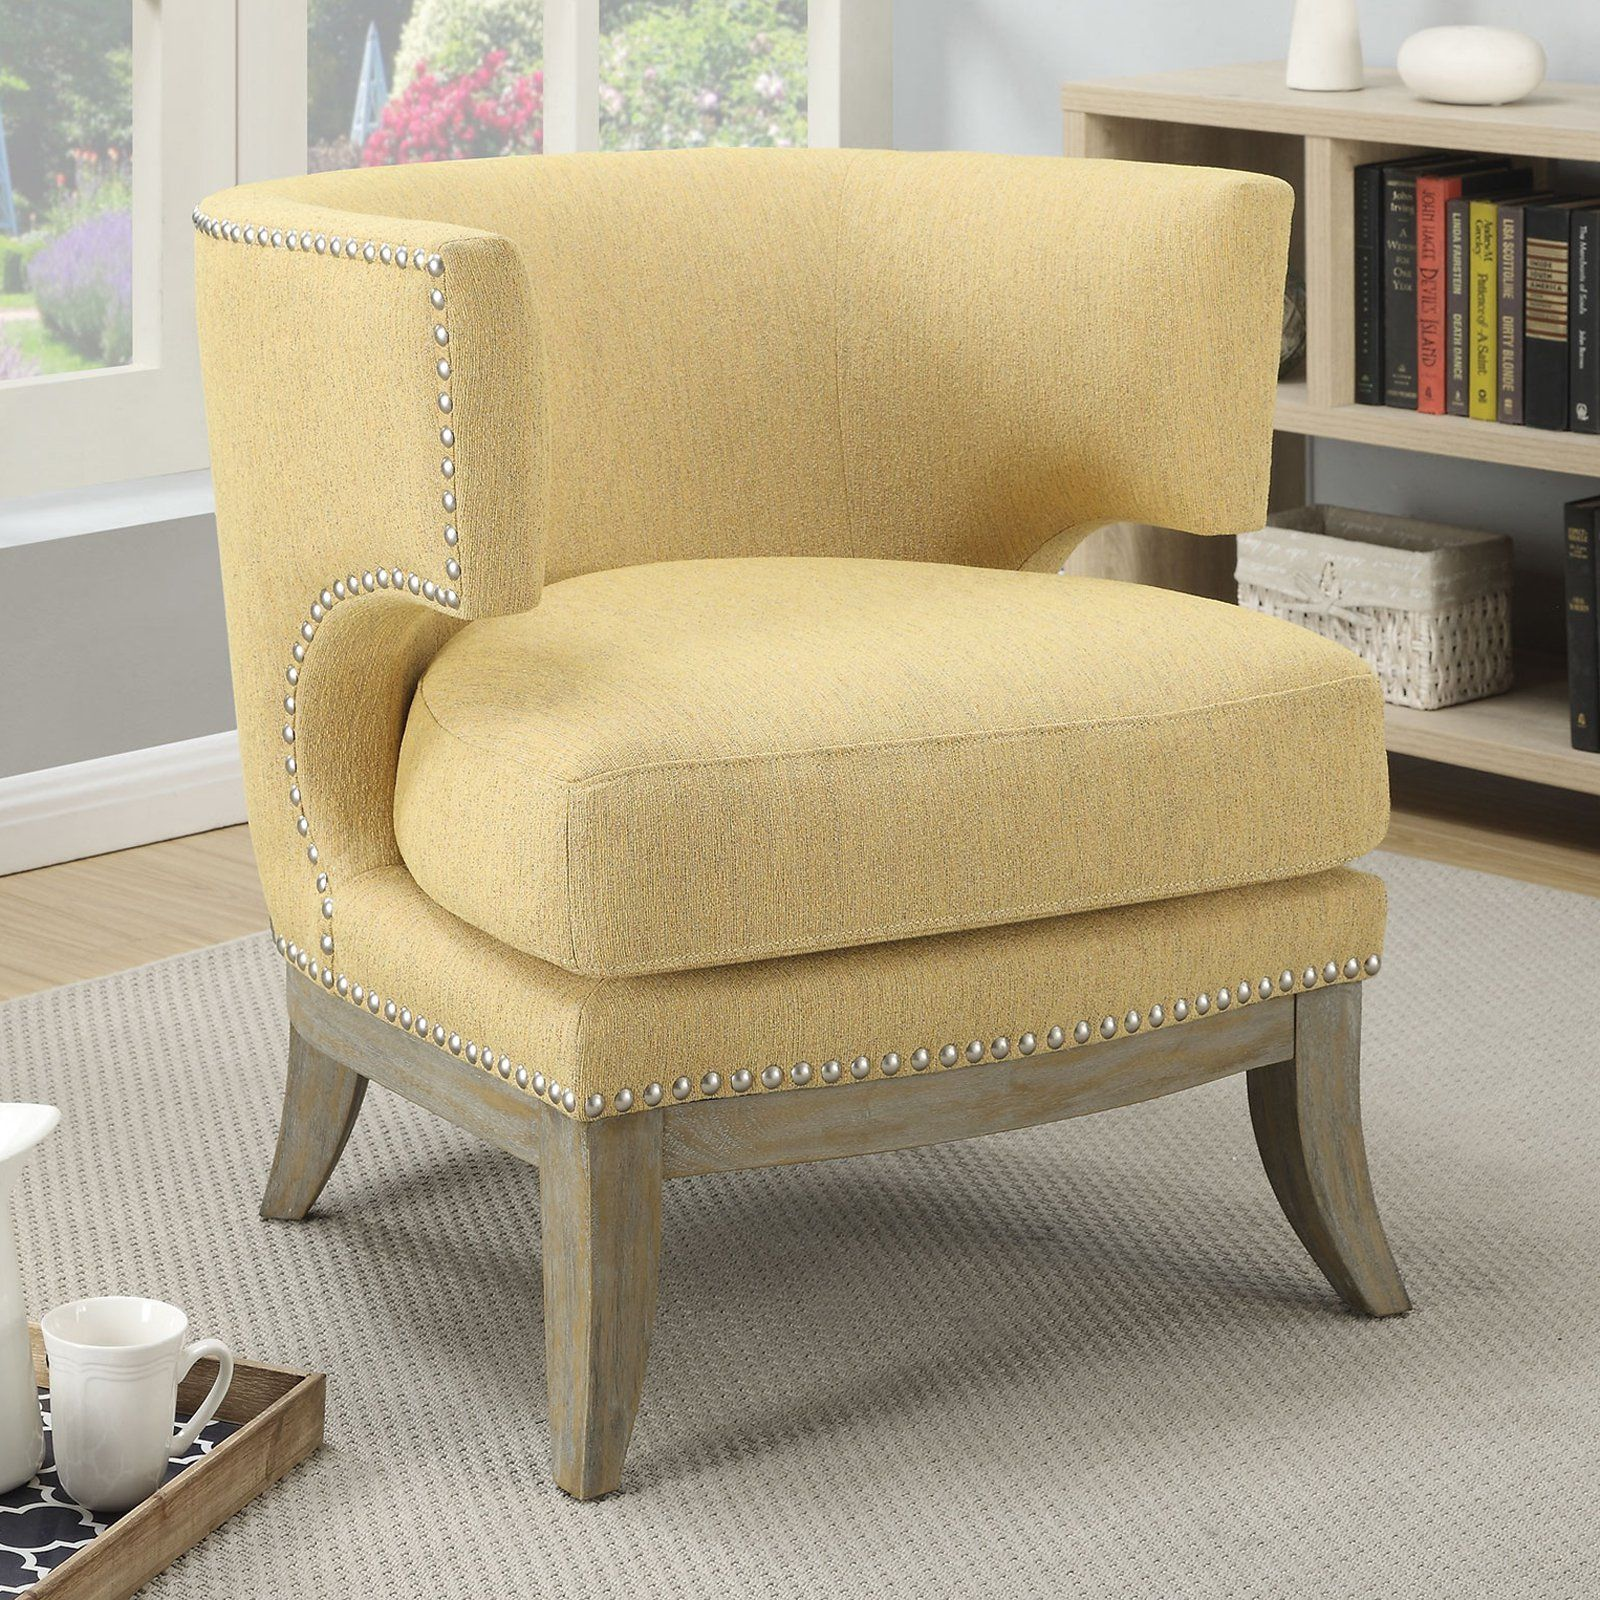 Terrific Coaster Furniture Fremont Accent Chair Grey Dh Coaster Machost Co Dining Chair Design Ideas Machostcouk